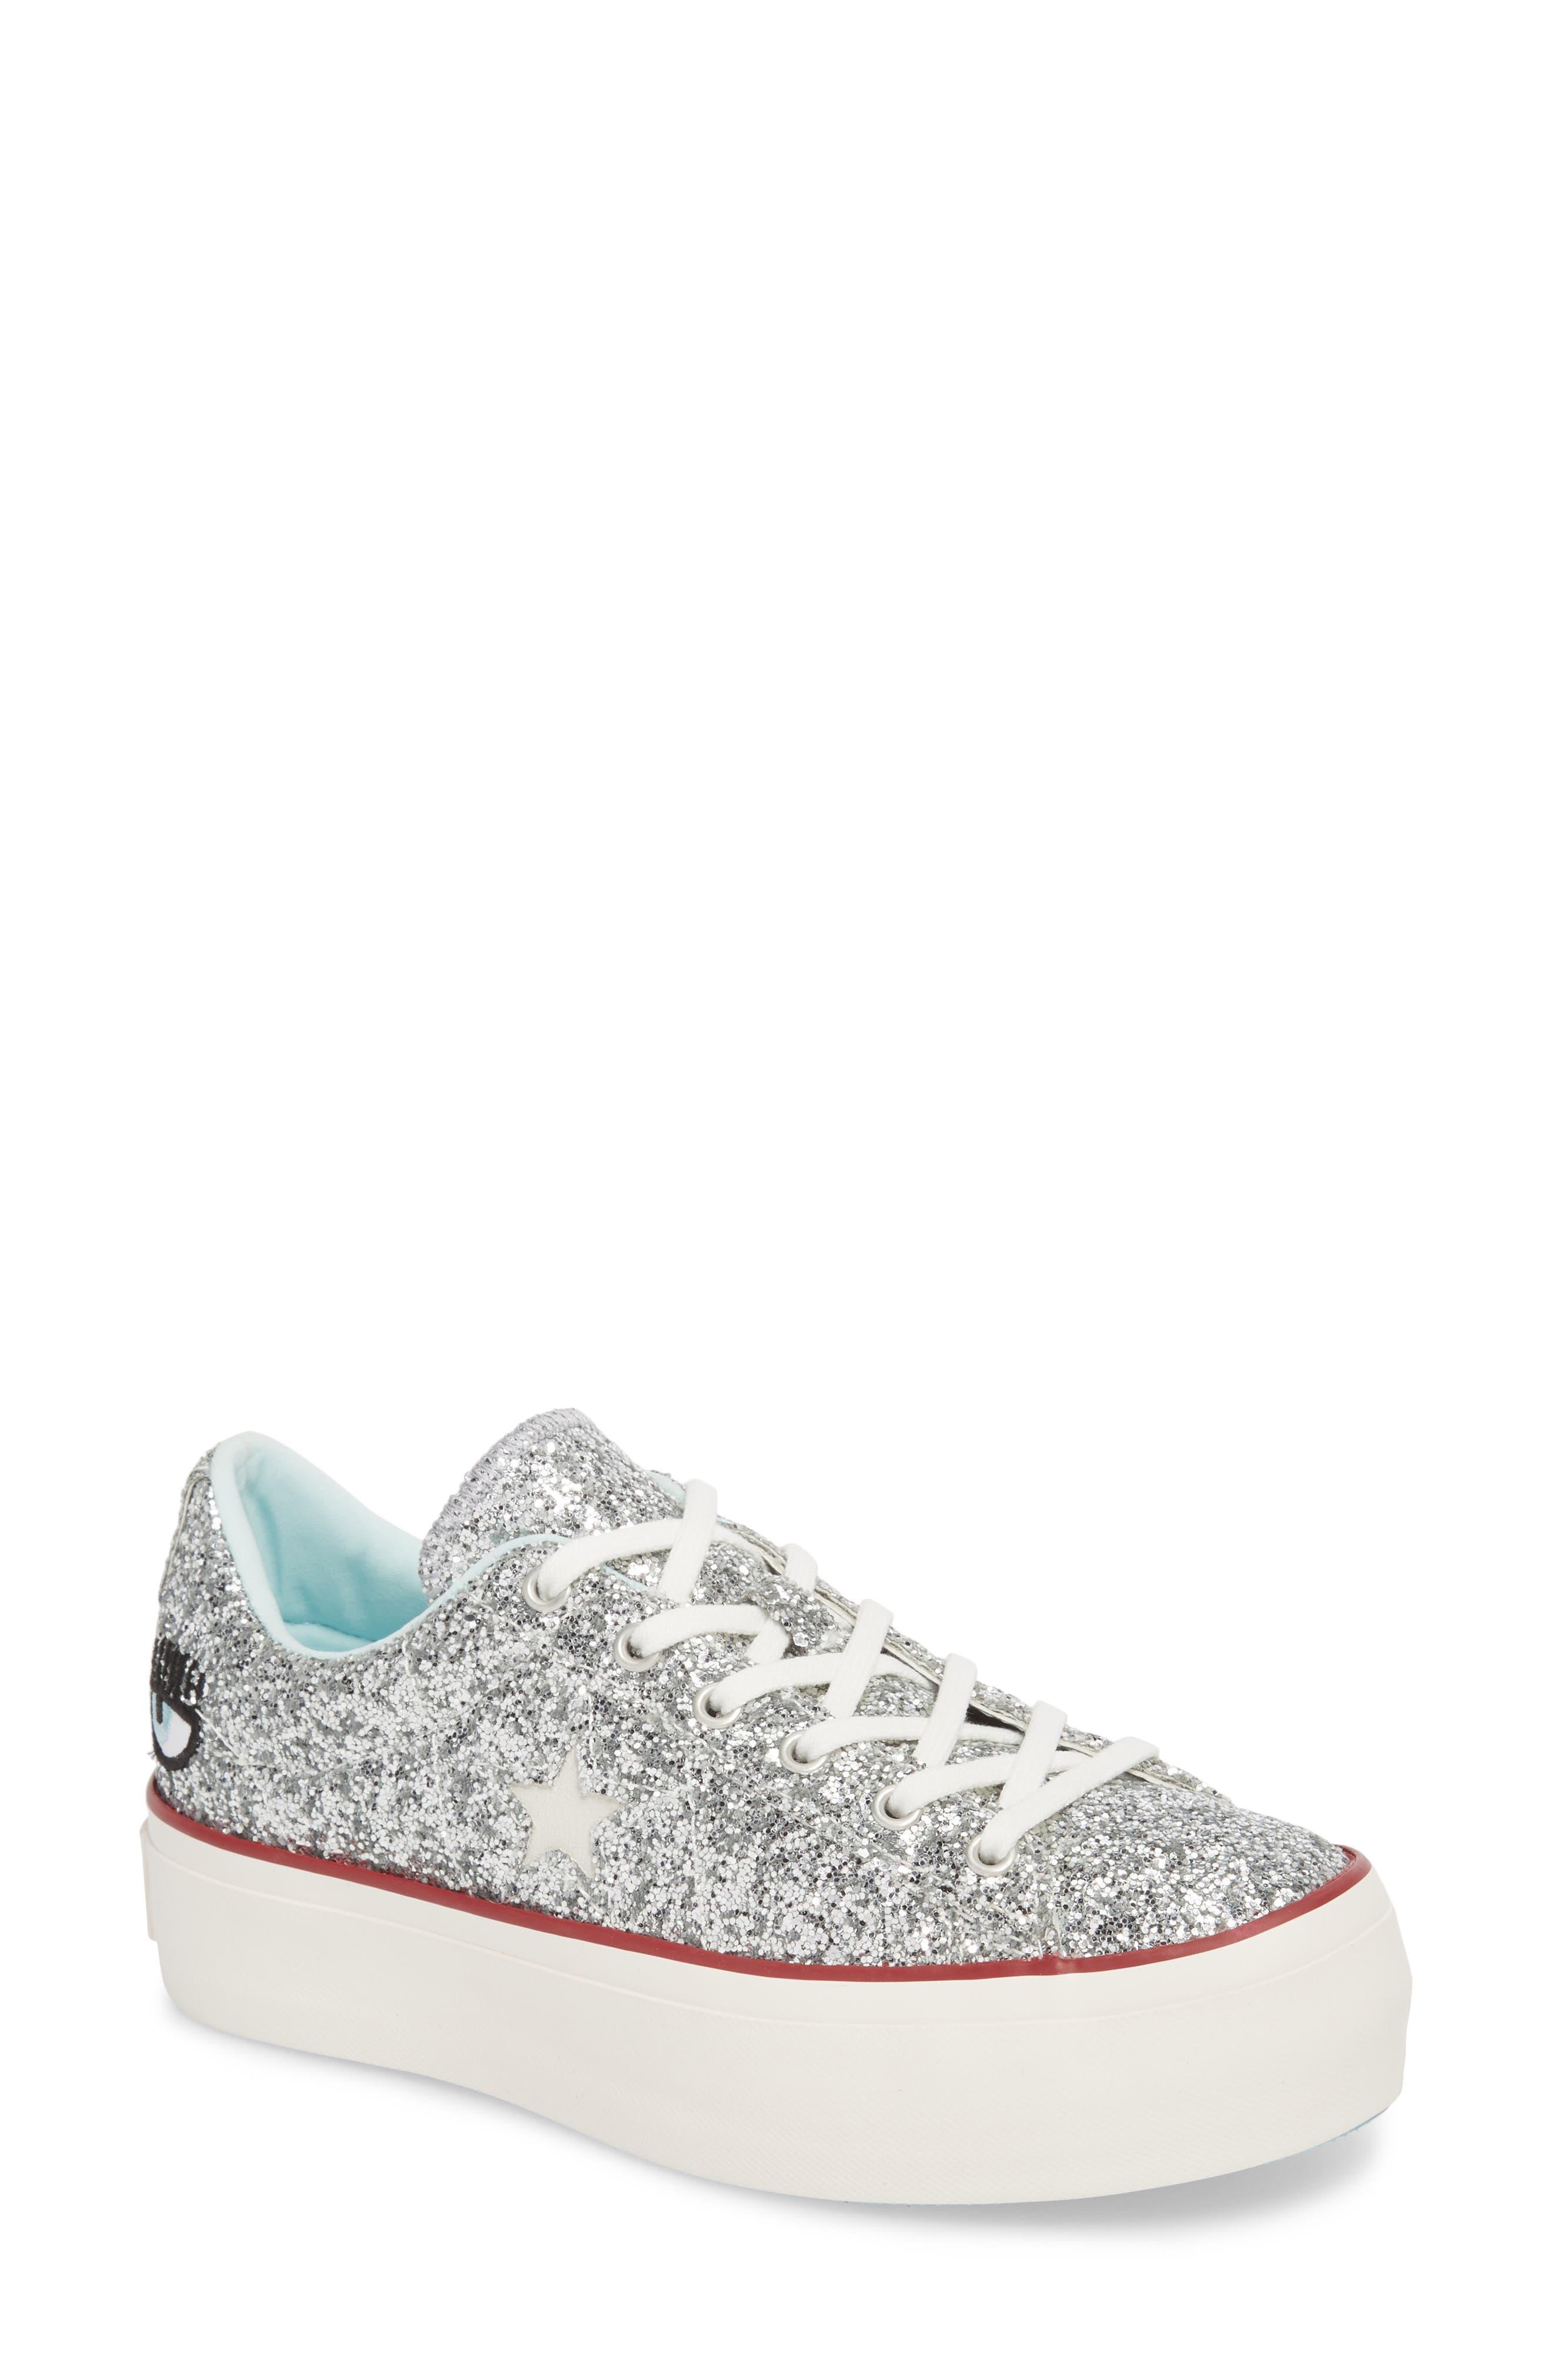 Converse x Chiara Ferragni One Star Glitter Platform Sneaker (Women)